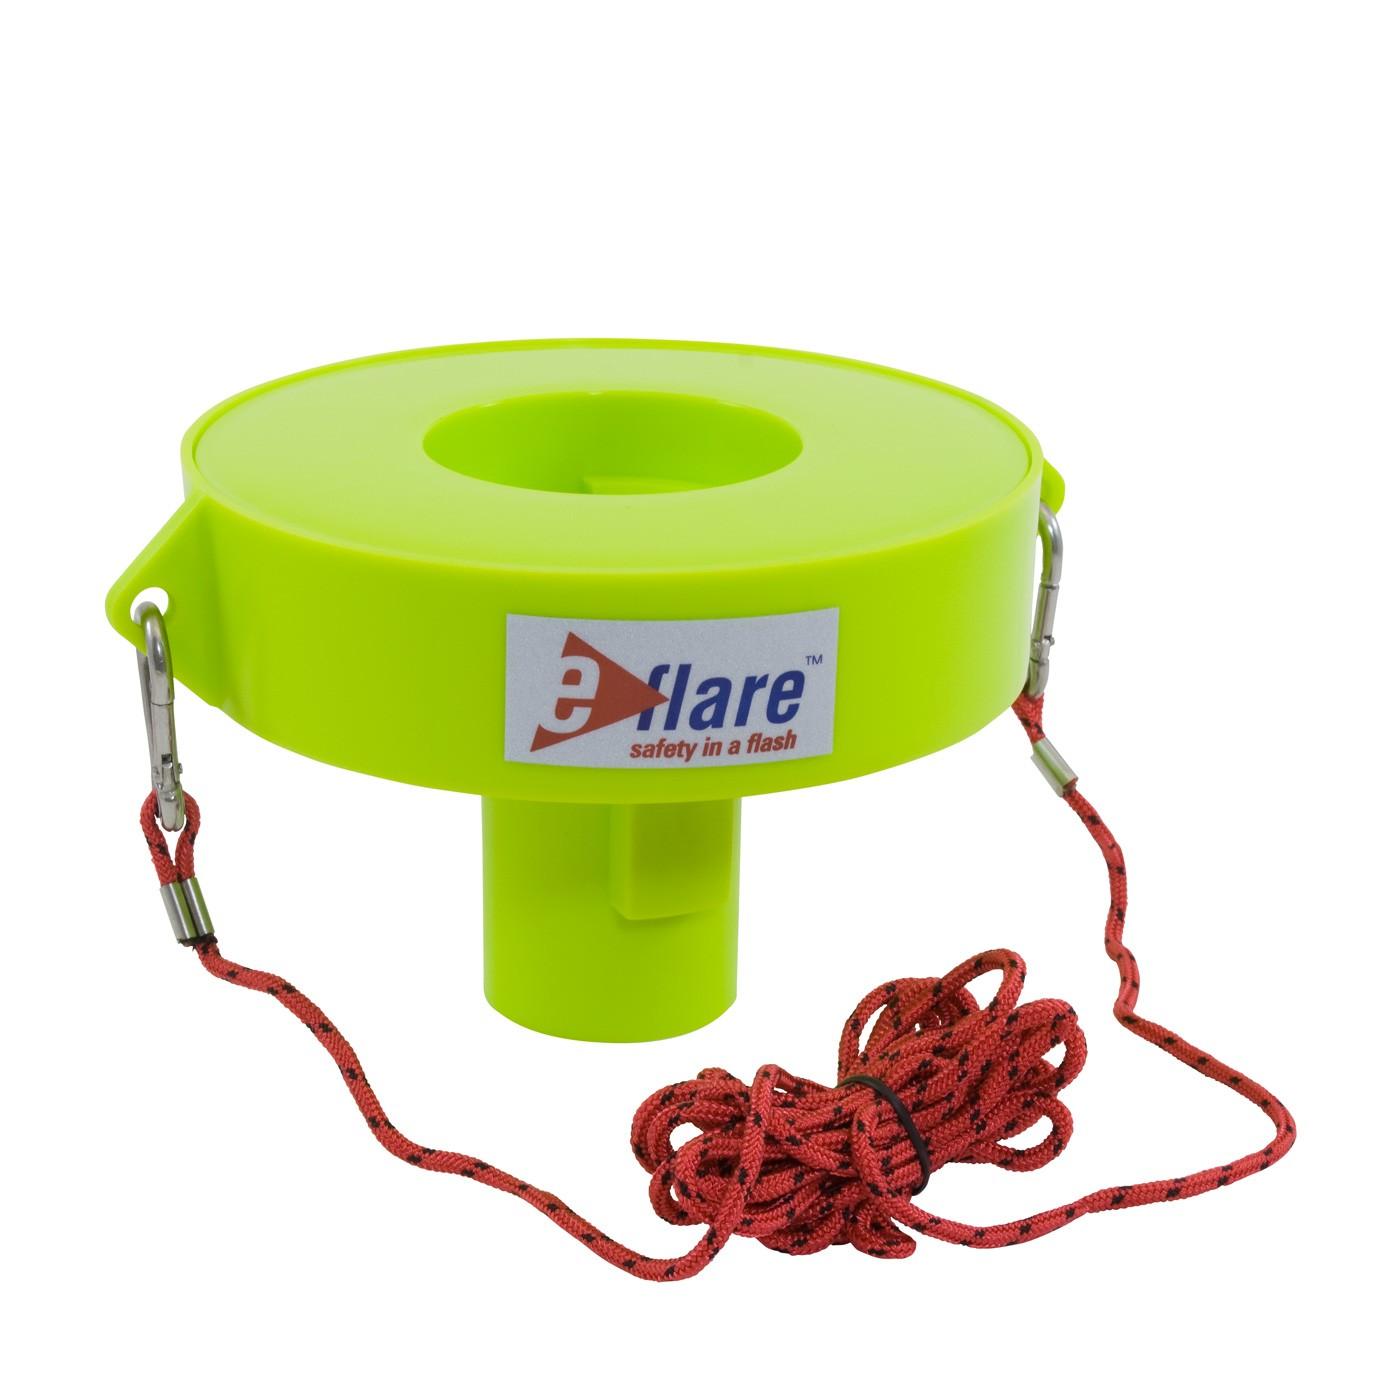 Eflare™ Flotation Collar  (#939-EFFLCOL/L)